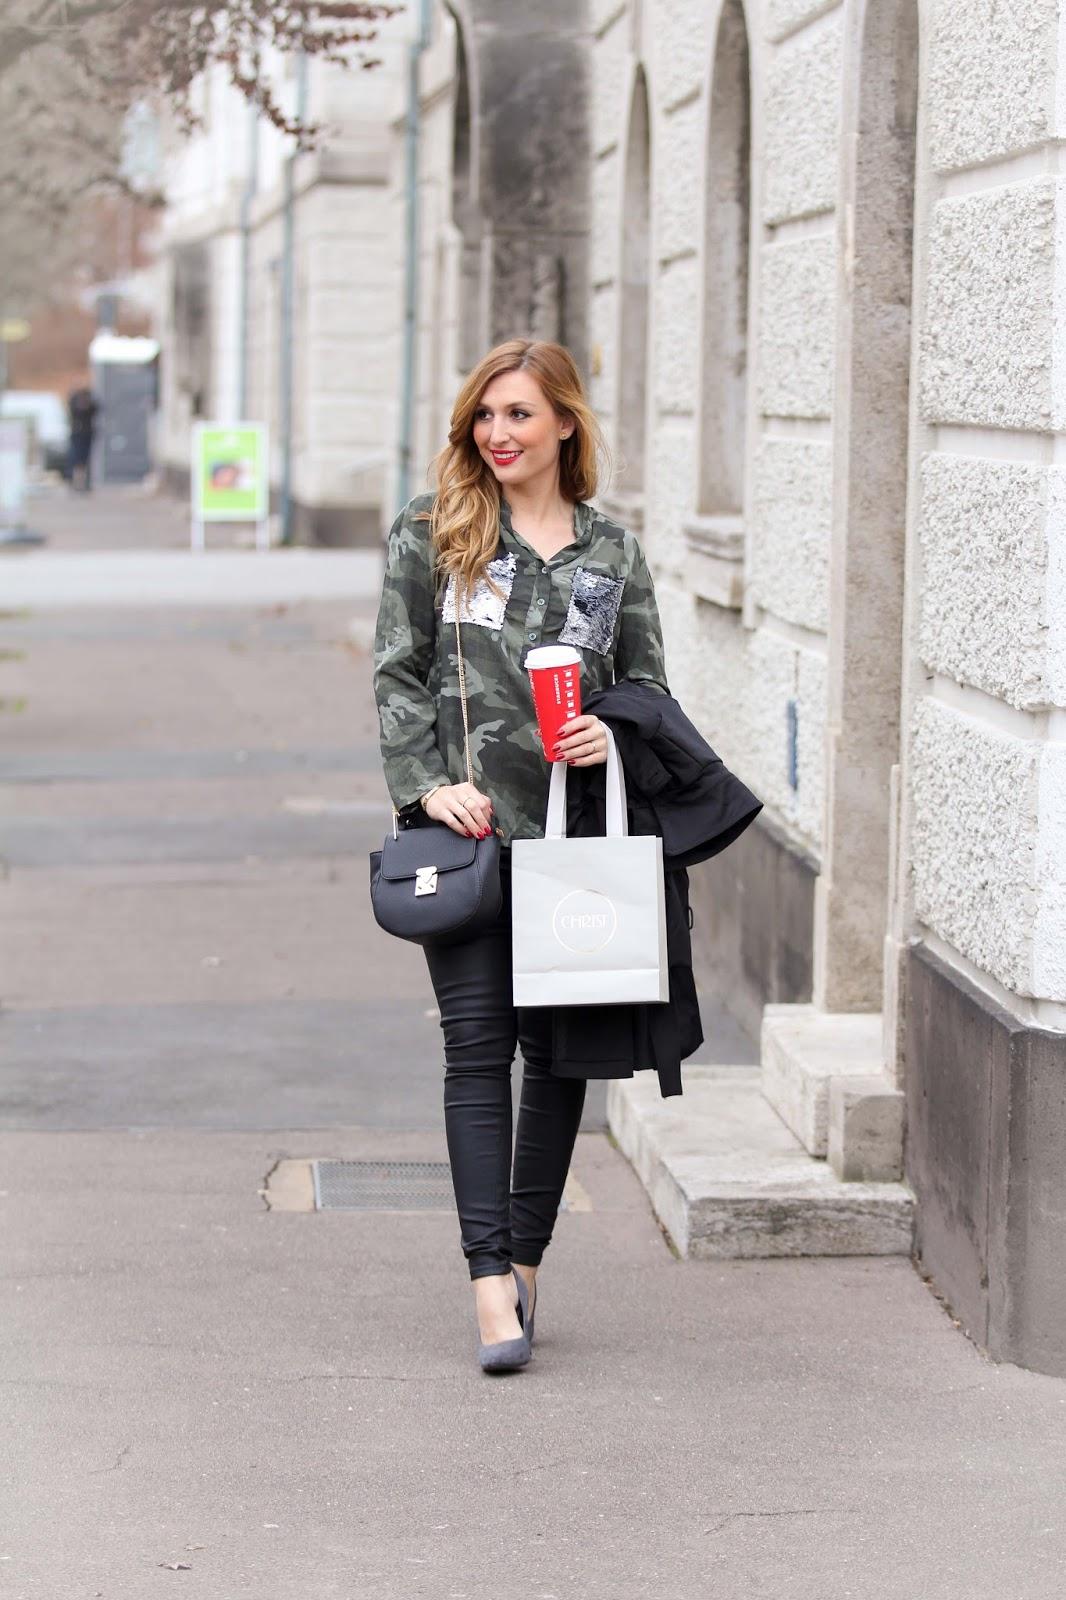 Fashionstylebyjohanna--fashionblog-muenchen-munich-blogger-fashionblogger-bloggerdeutschland-lifestyleblog-modeblog-muenchen-germanblogger-styleblog-bundfaltenhose-a-la-streetwear